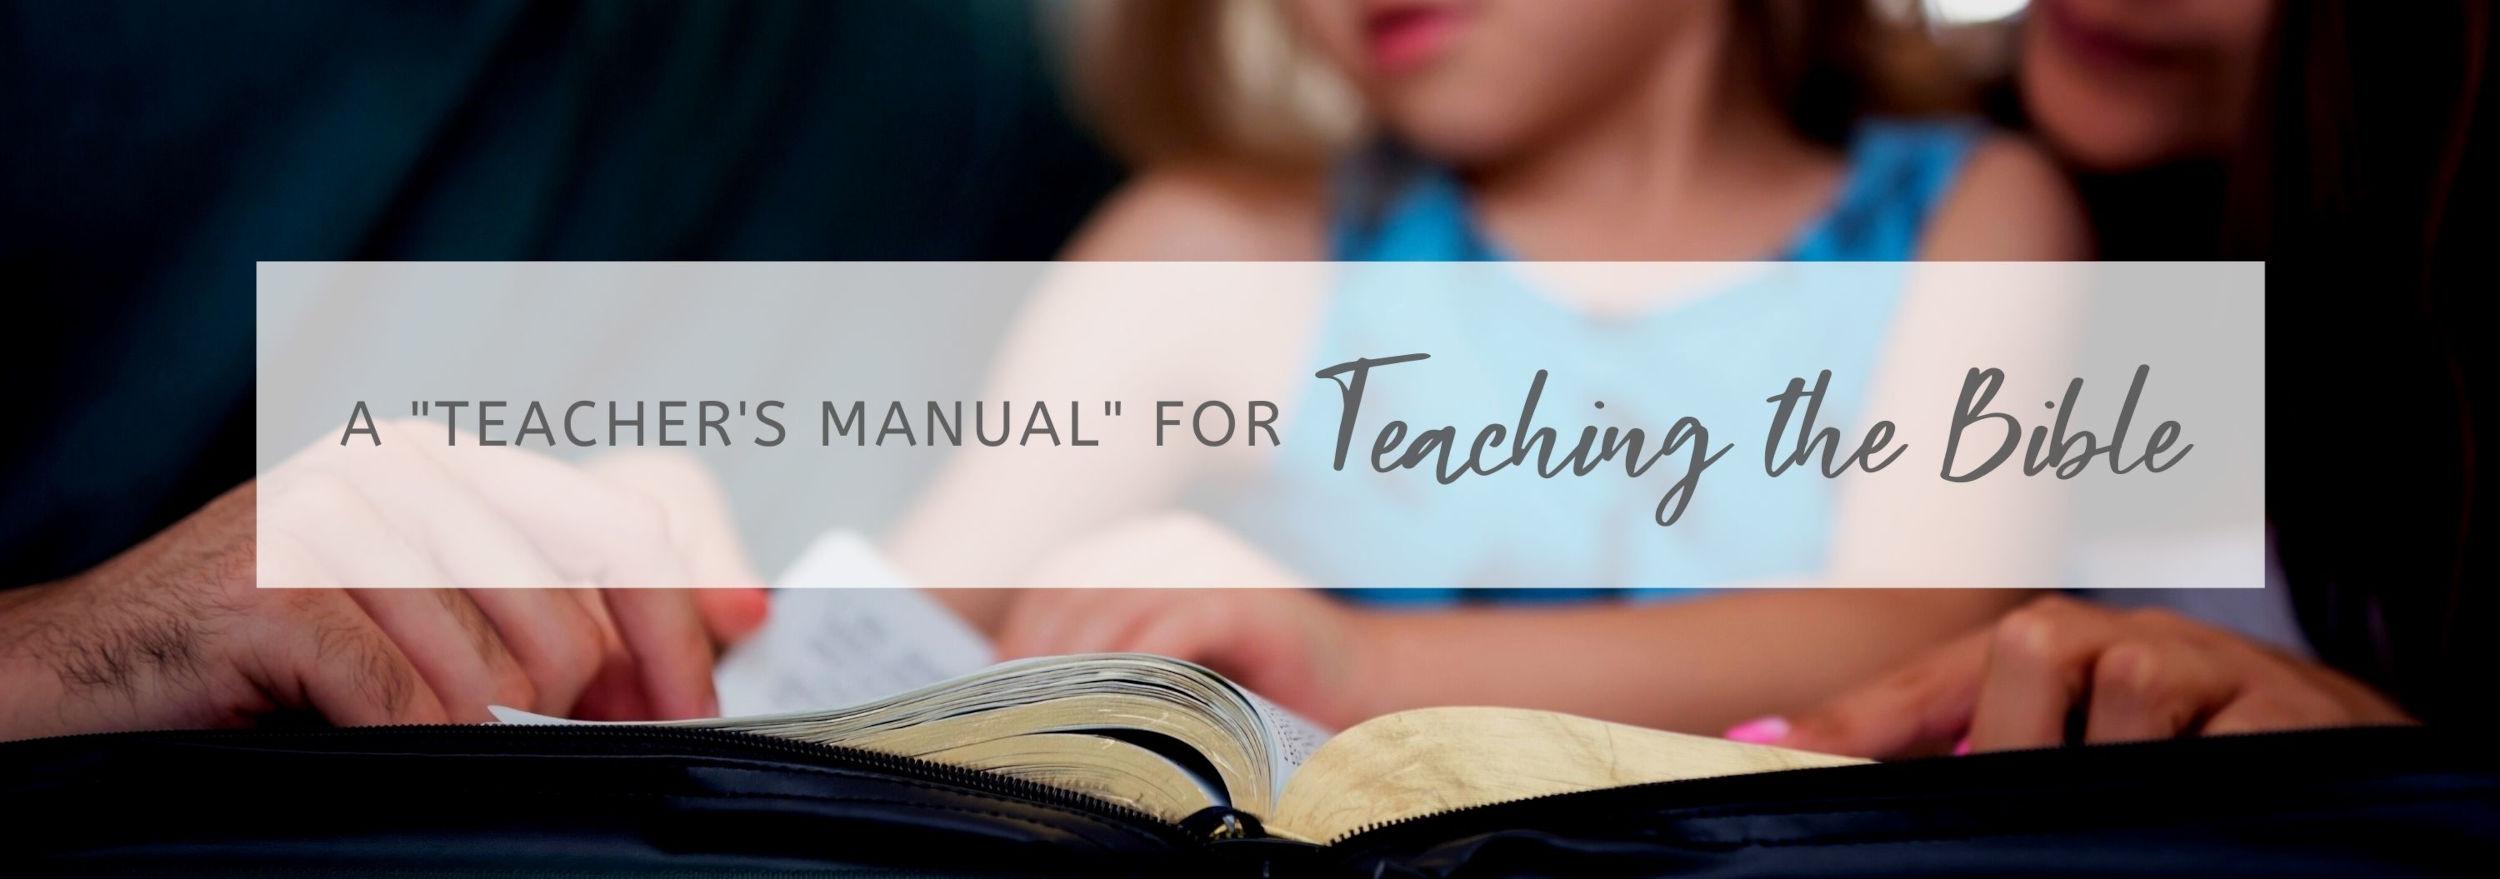 teaching the bible